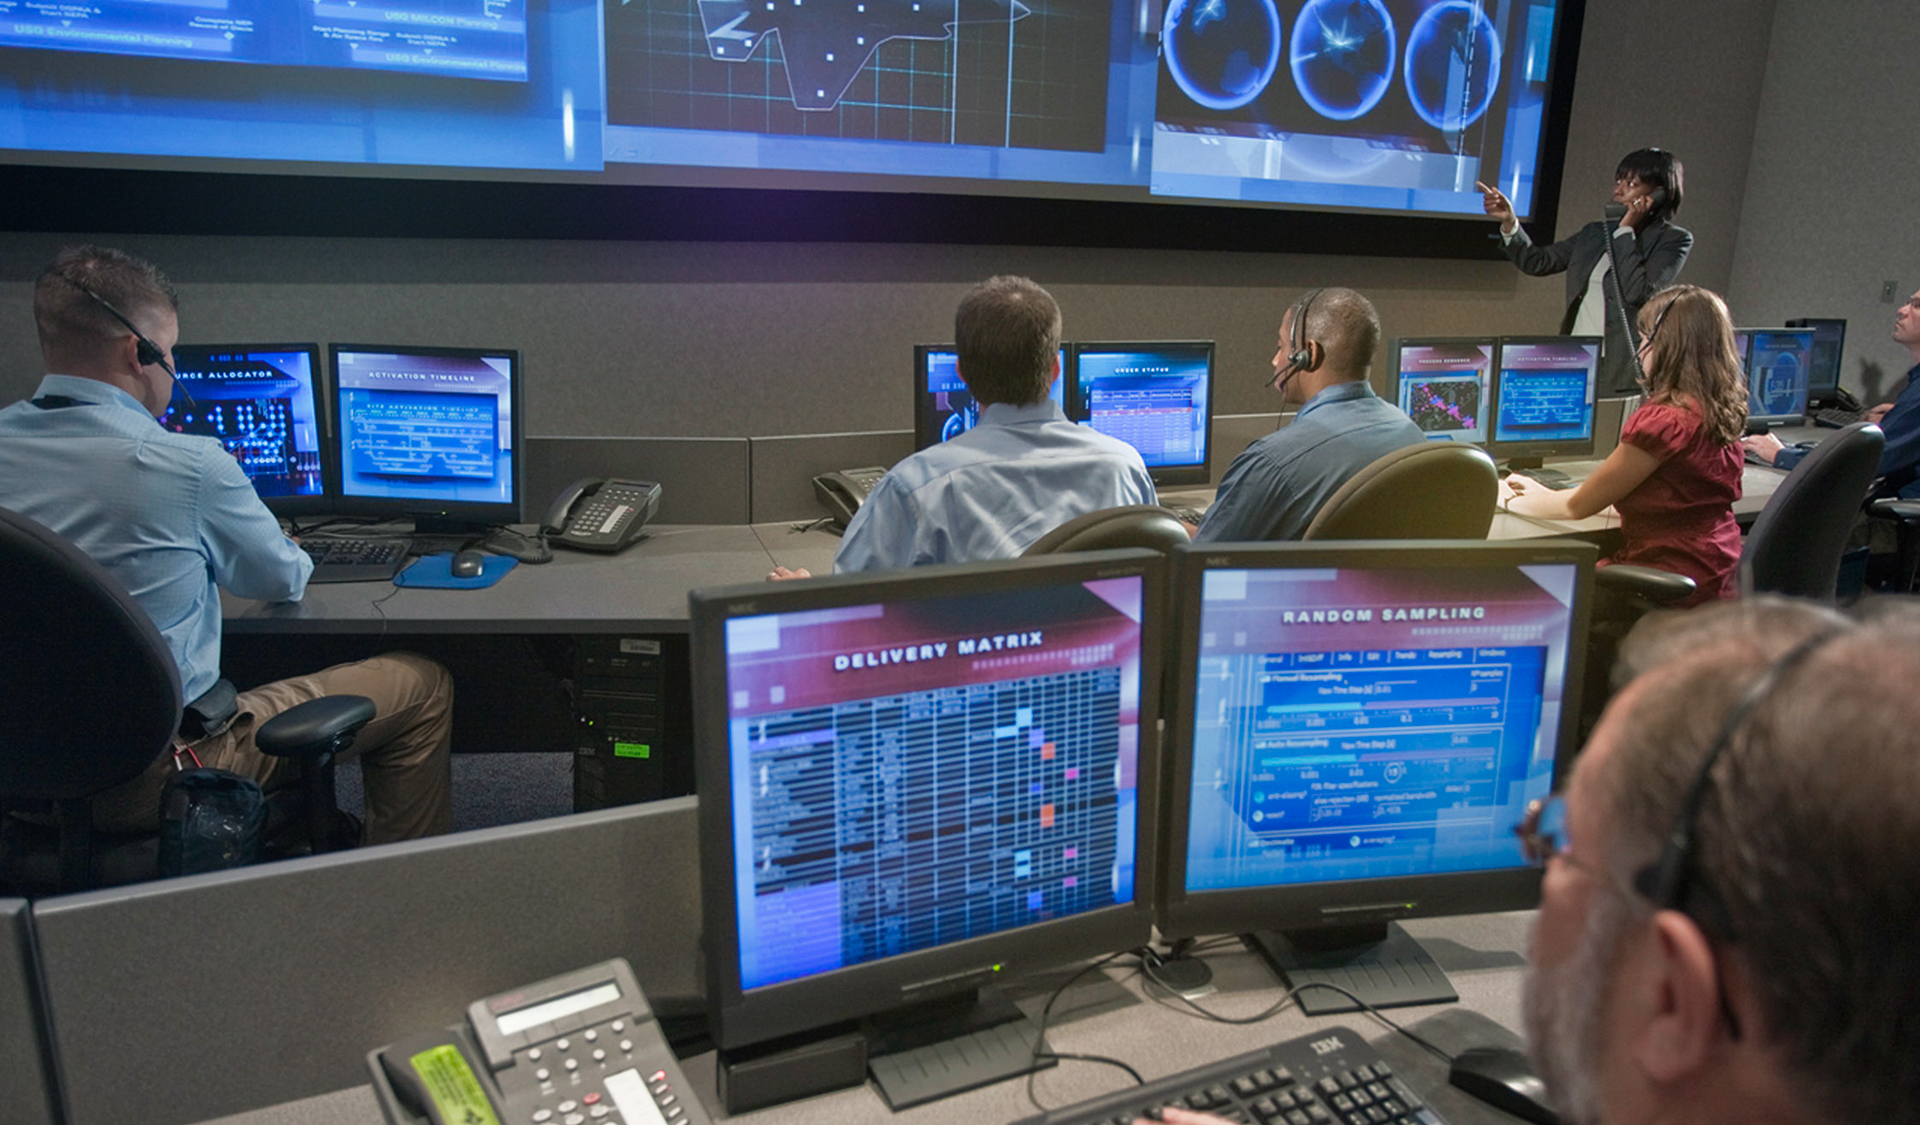 Autonomic Logistics Information System Alis Lockheed